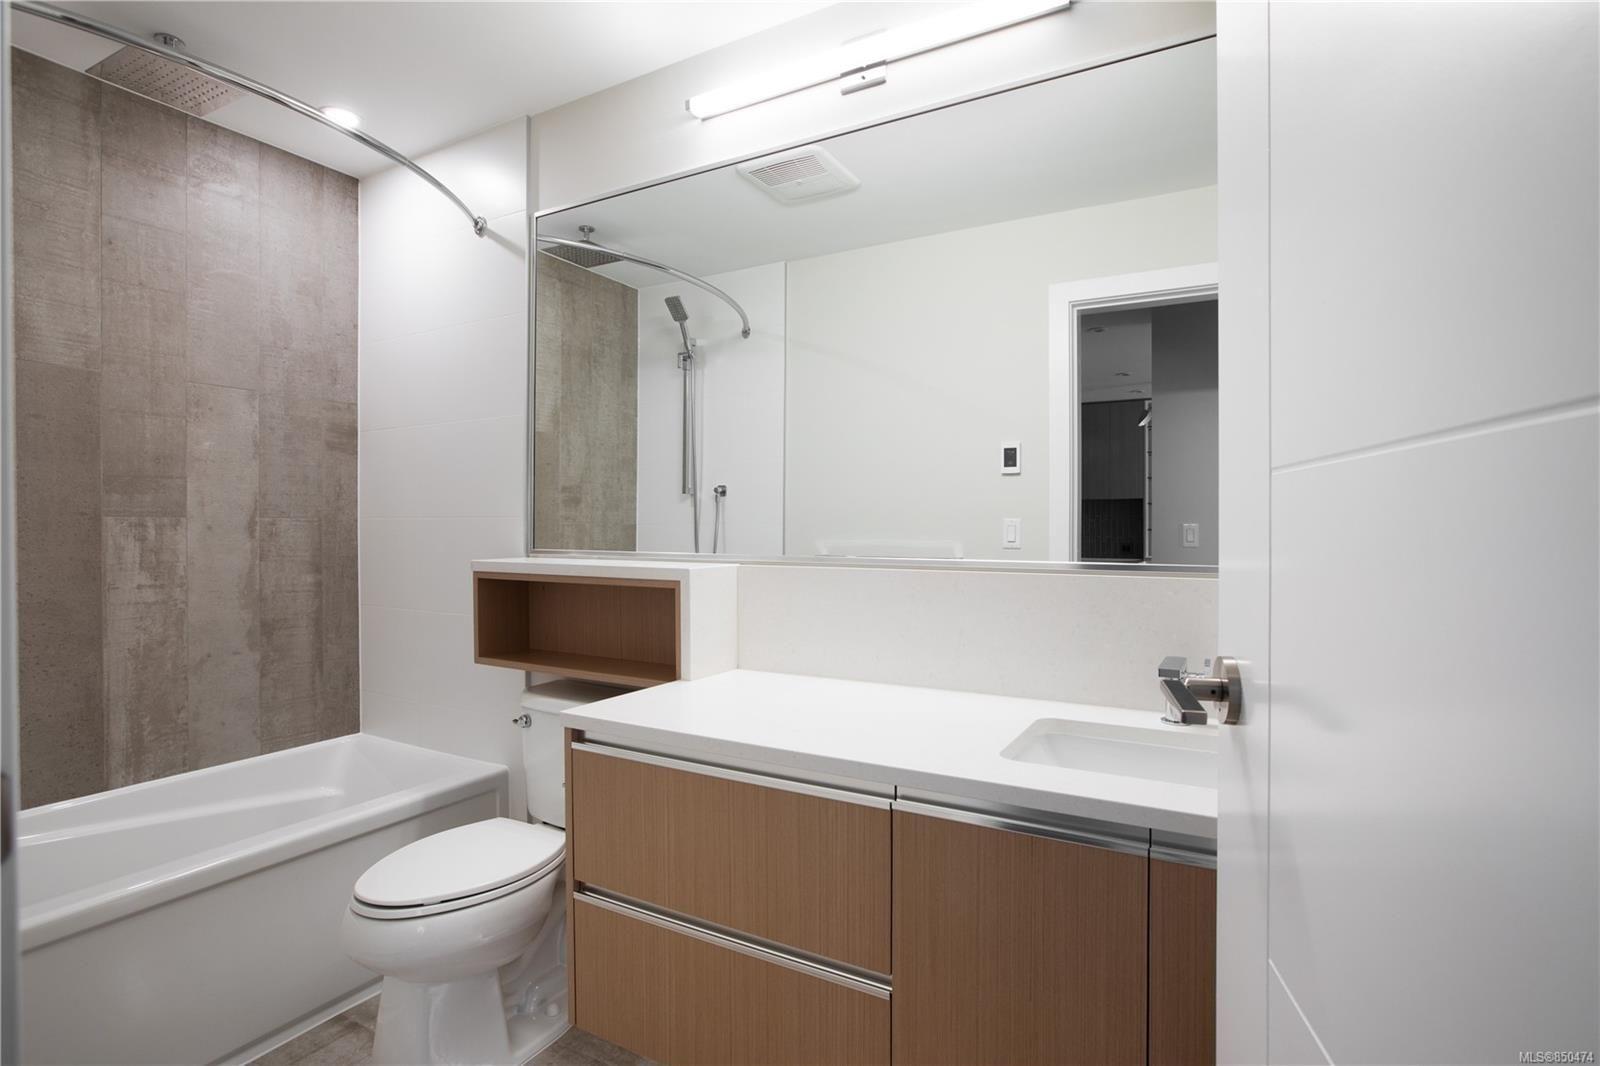 Photo 9: Photos: 309 2285 Bowker Ave in : OB North Oak Bay Condo for sale (Oak Bay)  : MLS®# 850474